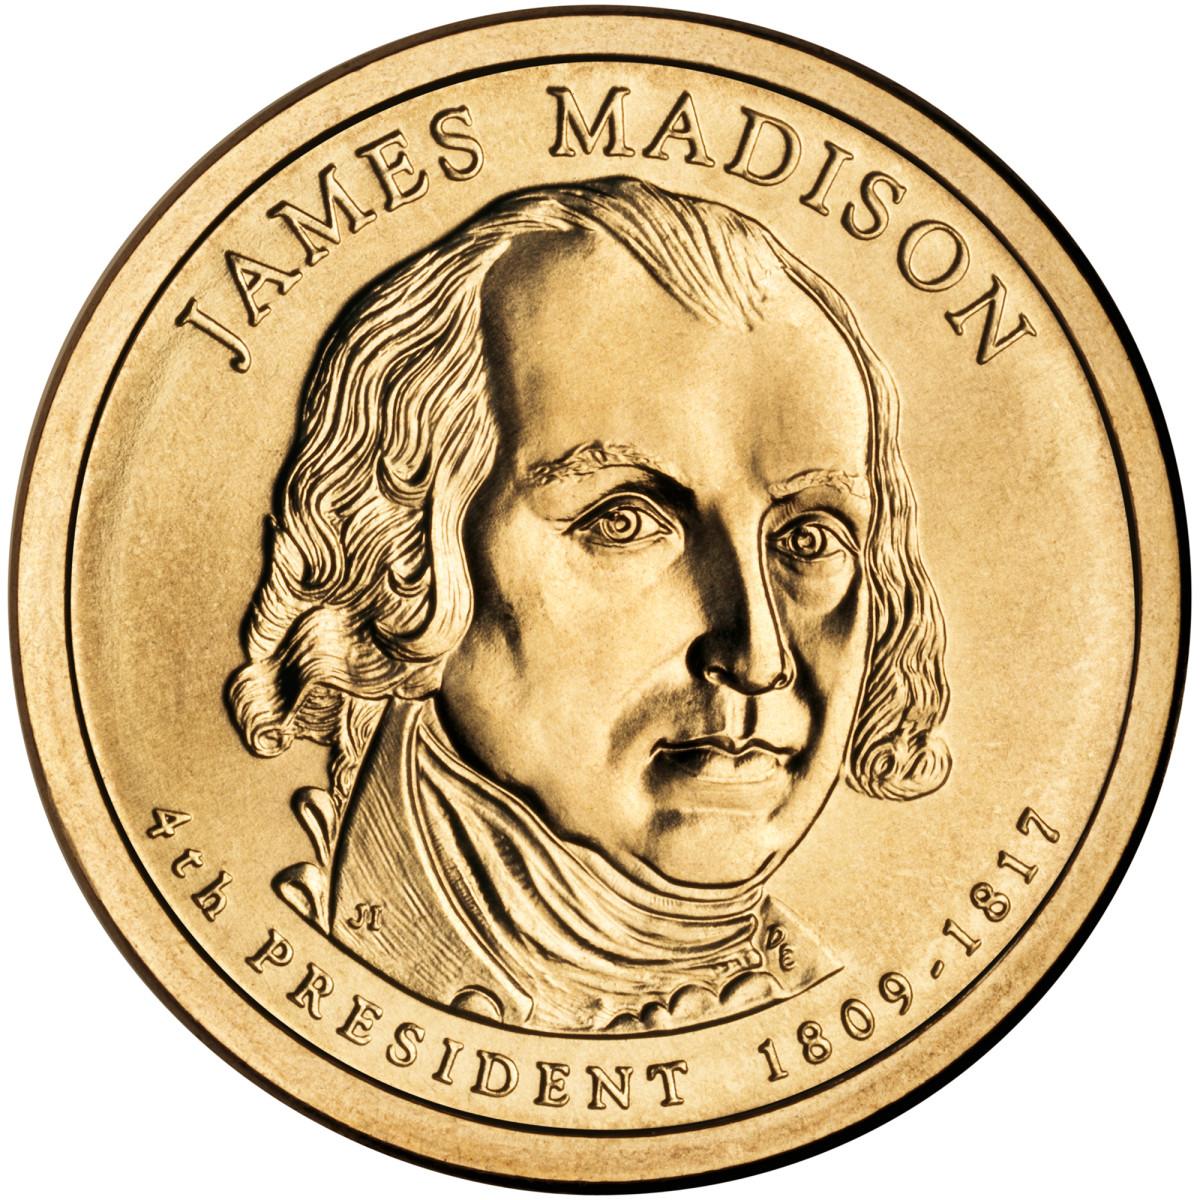 2007 James Madison U.S. presidential dollar coin.